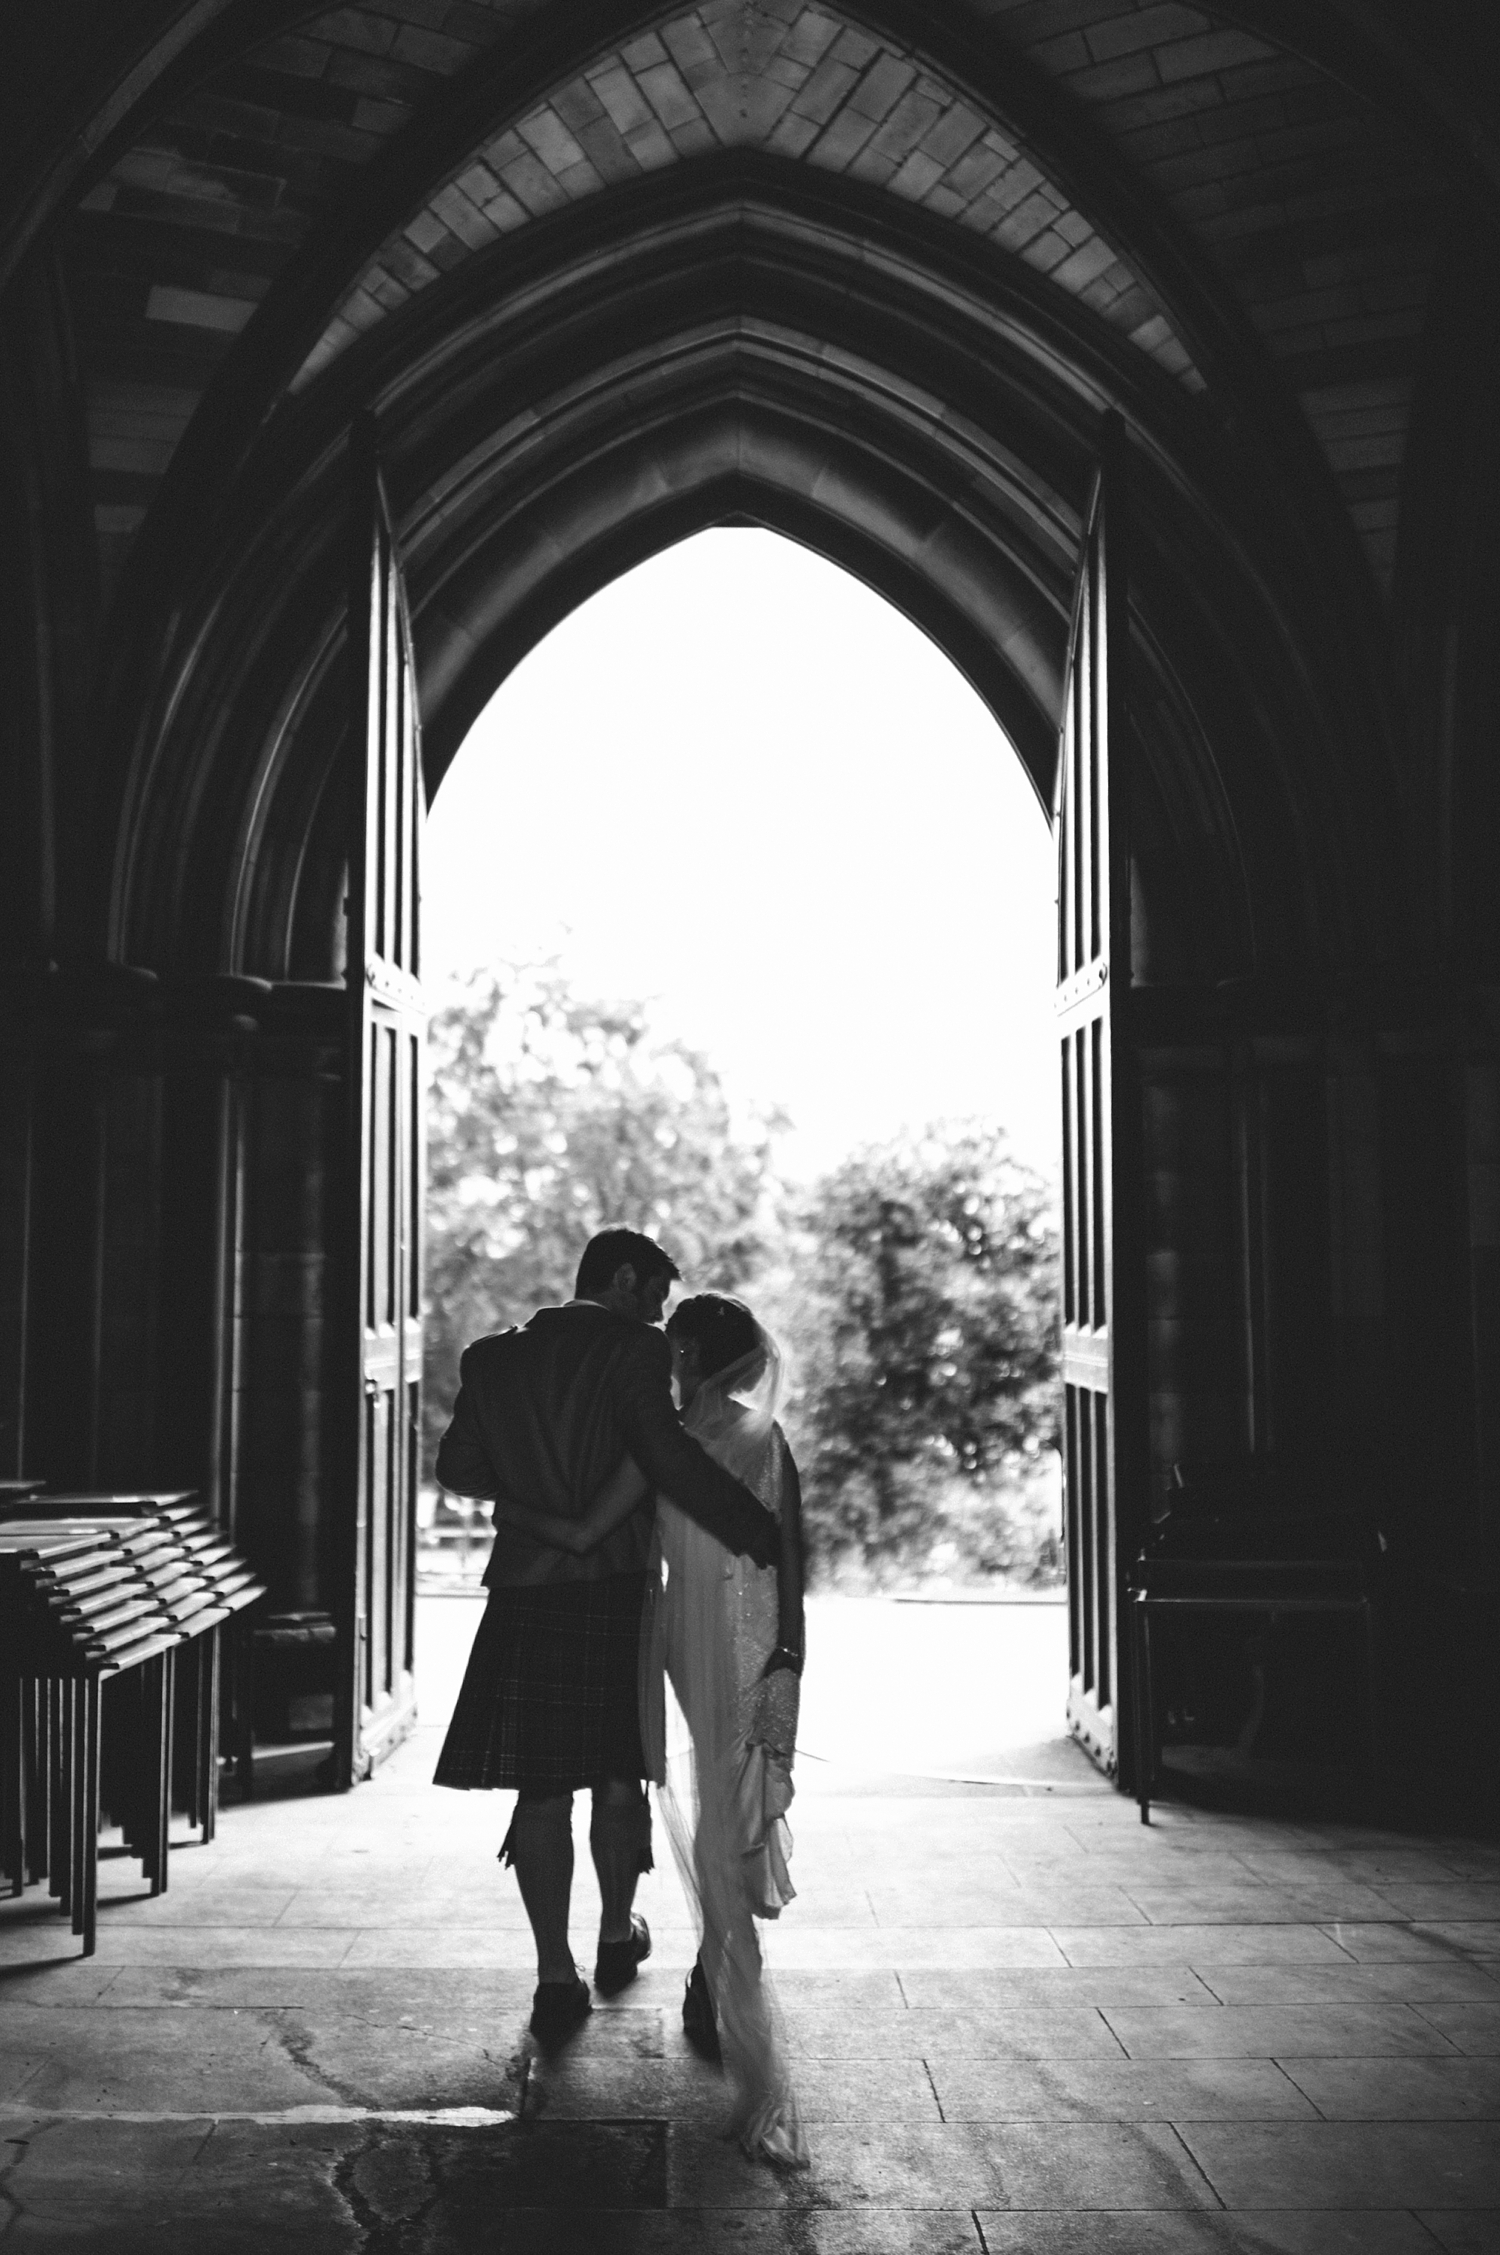 042-lisa-devine-photography-alternative-creative-wedding-photography-glasgow-scotland-uk.JPG